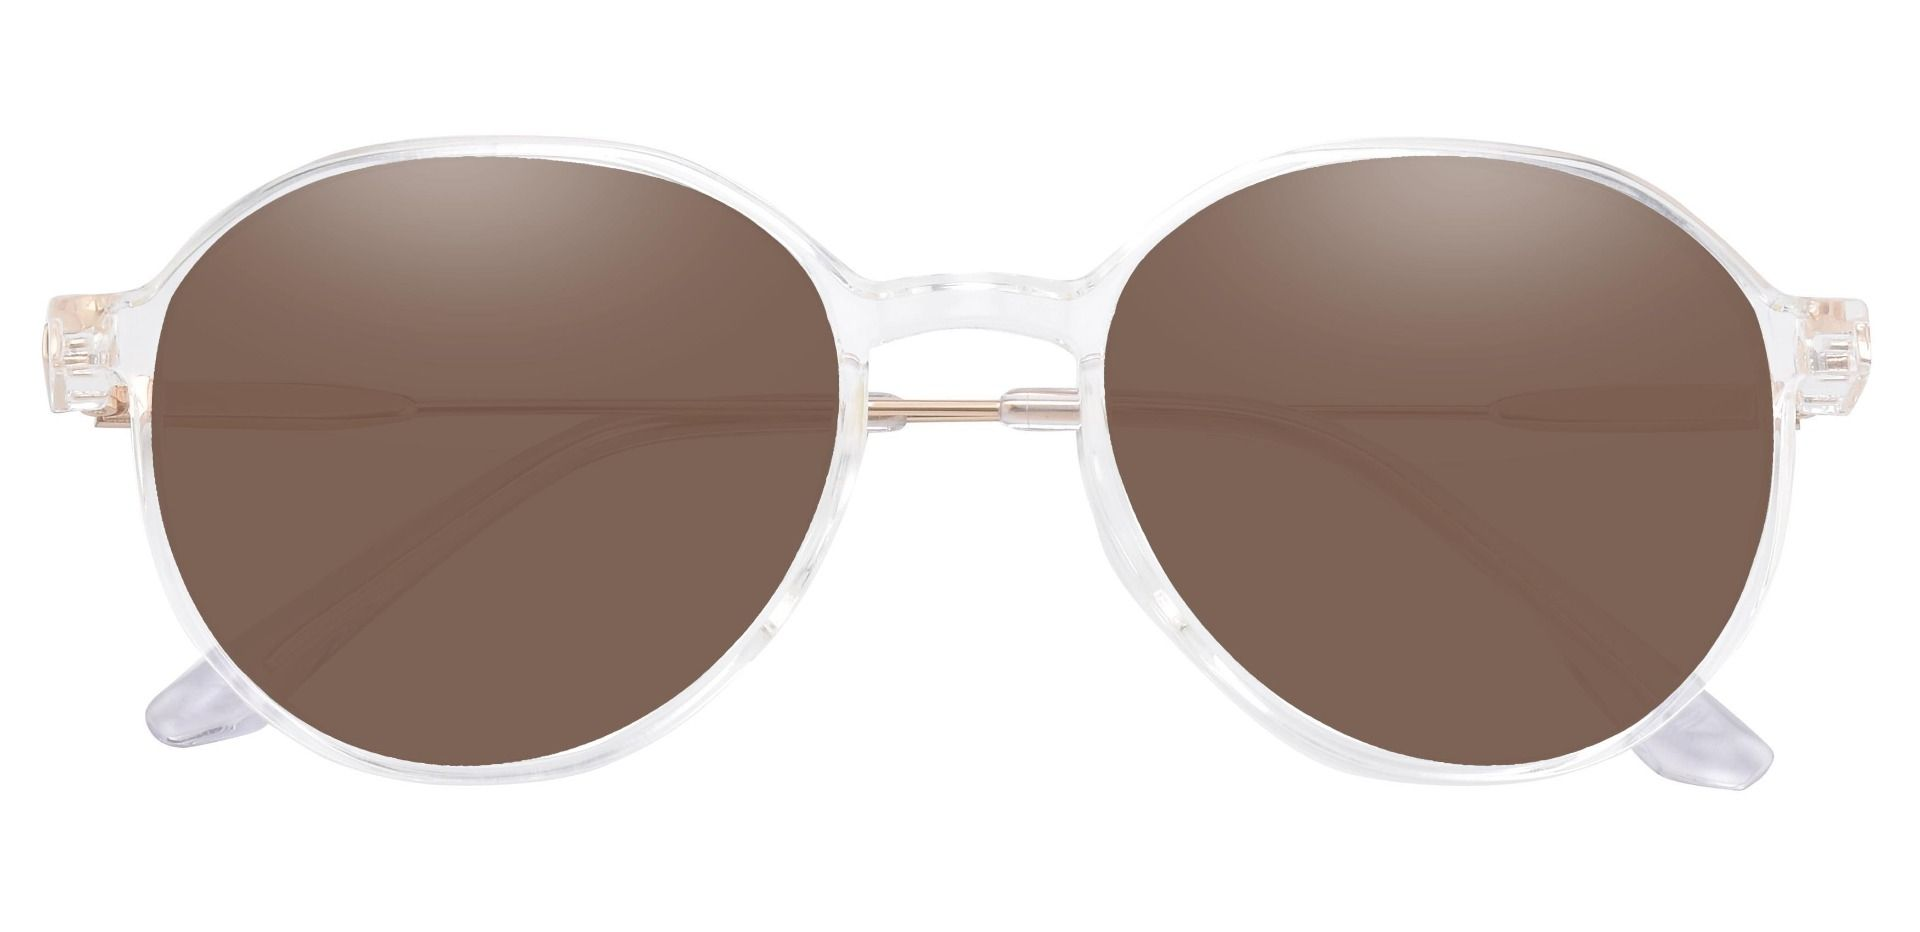 Daytona Geometric Prescription Sunglasses - Clear Frame With Brown Lenses